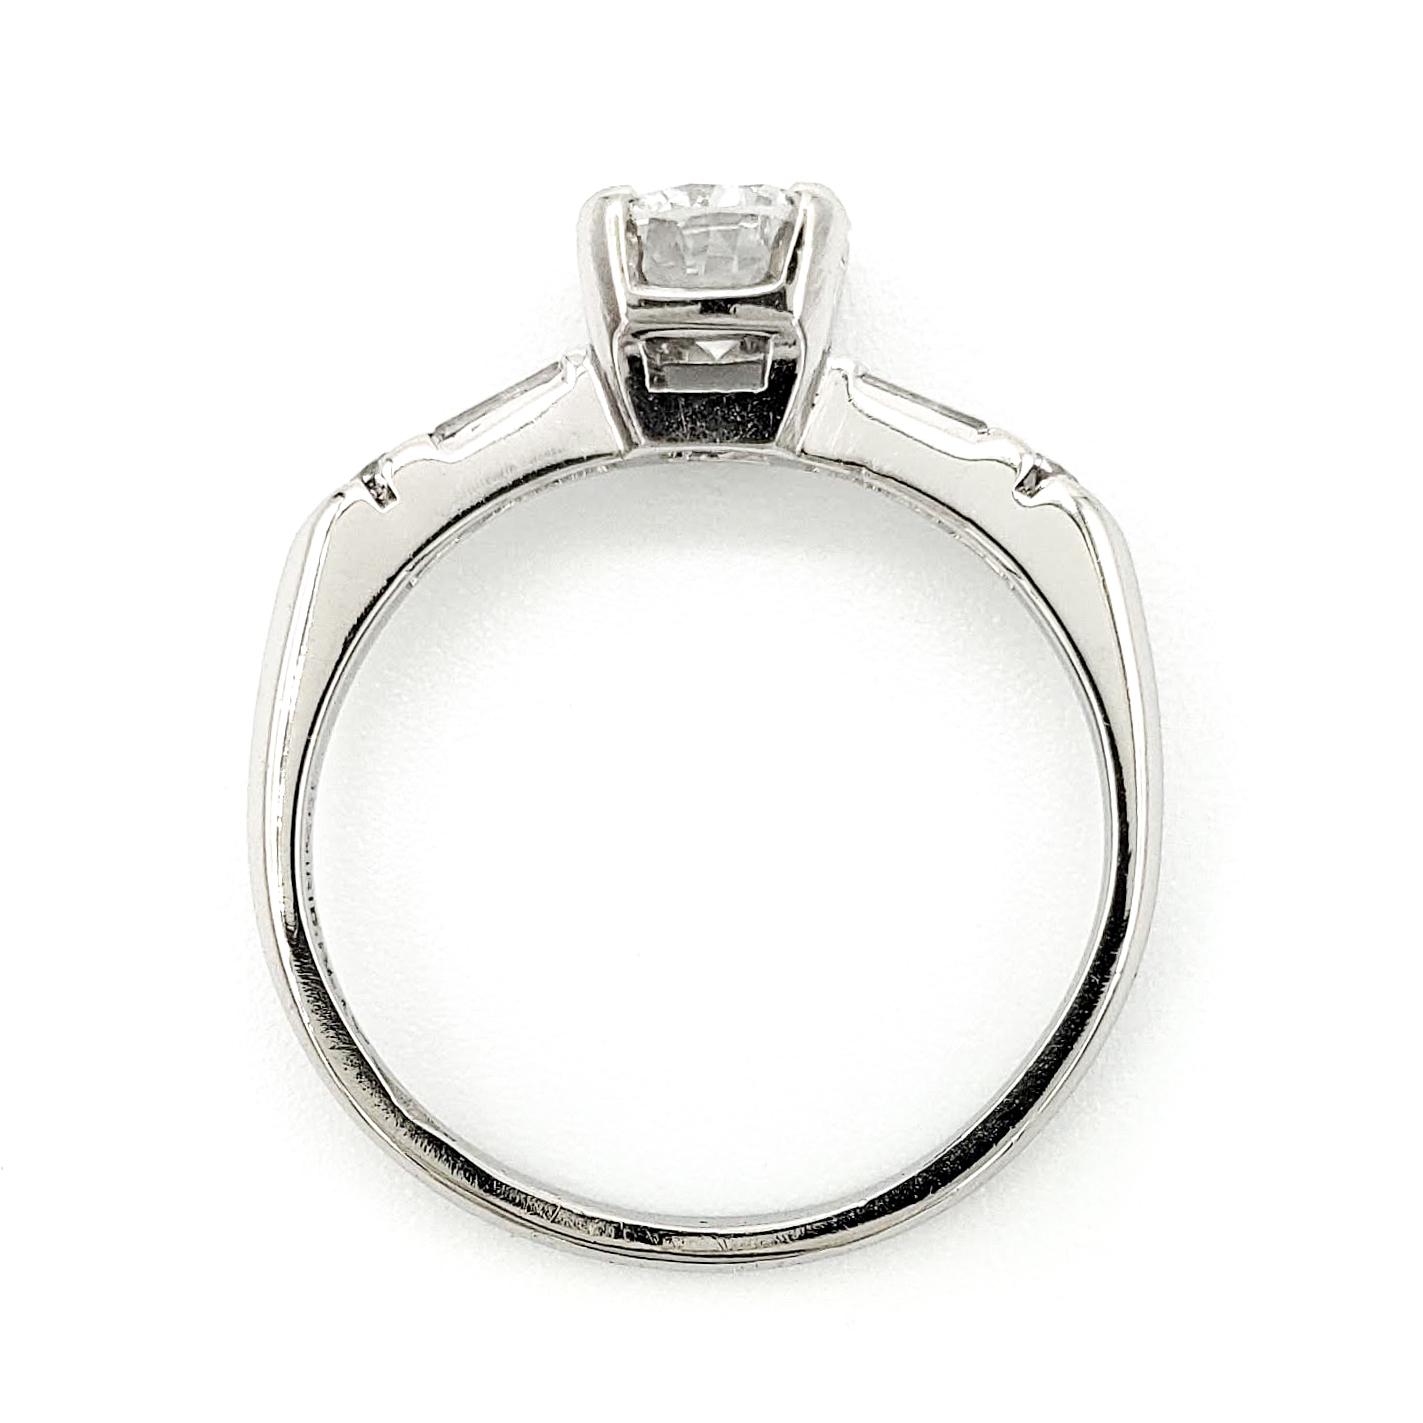 vintage-platinum-engagement-ring-with-0-57-carat-round-brilliant-cut-diamond-gia-e-vs2